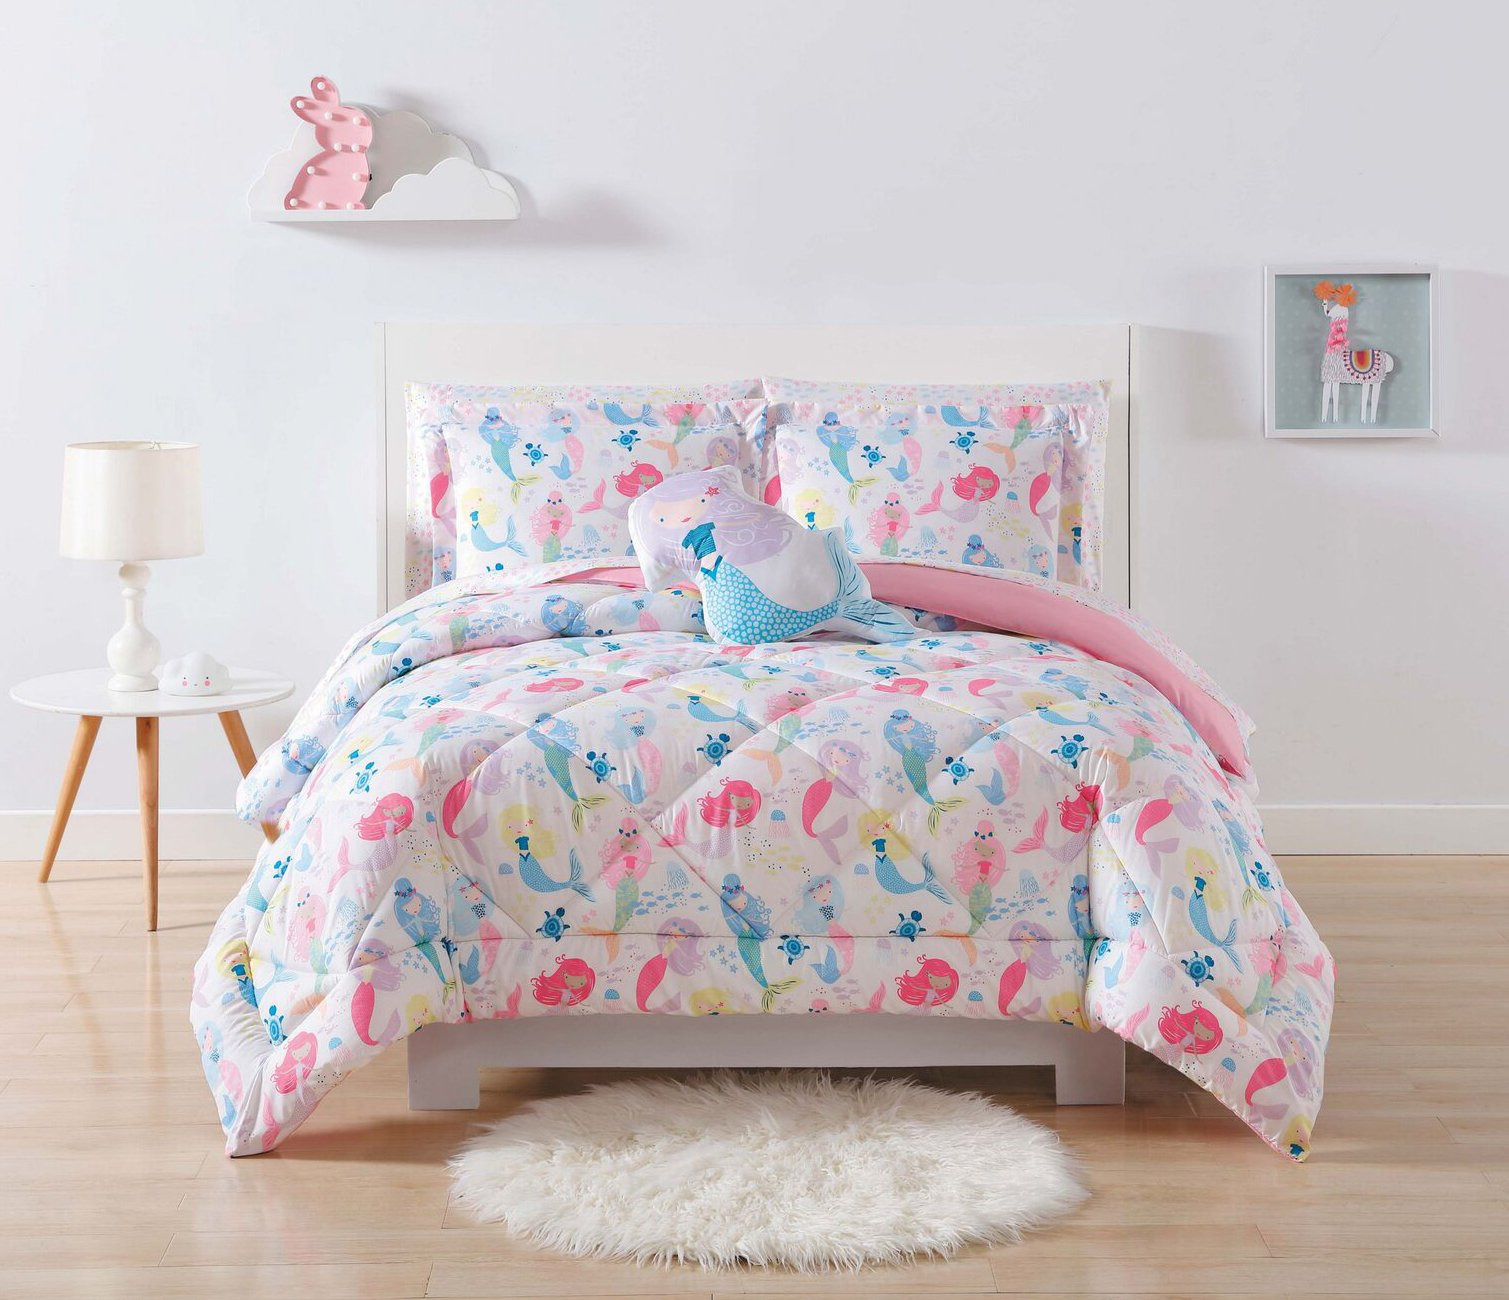 Laura Hart Kids Comforter Set, Twin/Twin XL, Mermaids by Laura Hart Kids